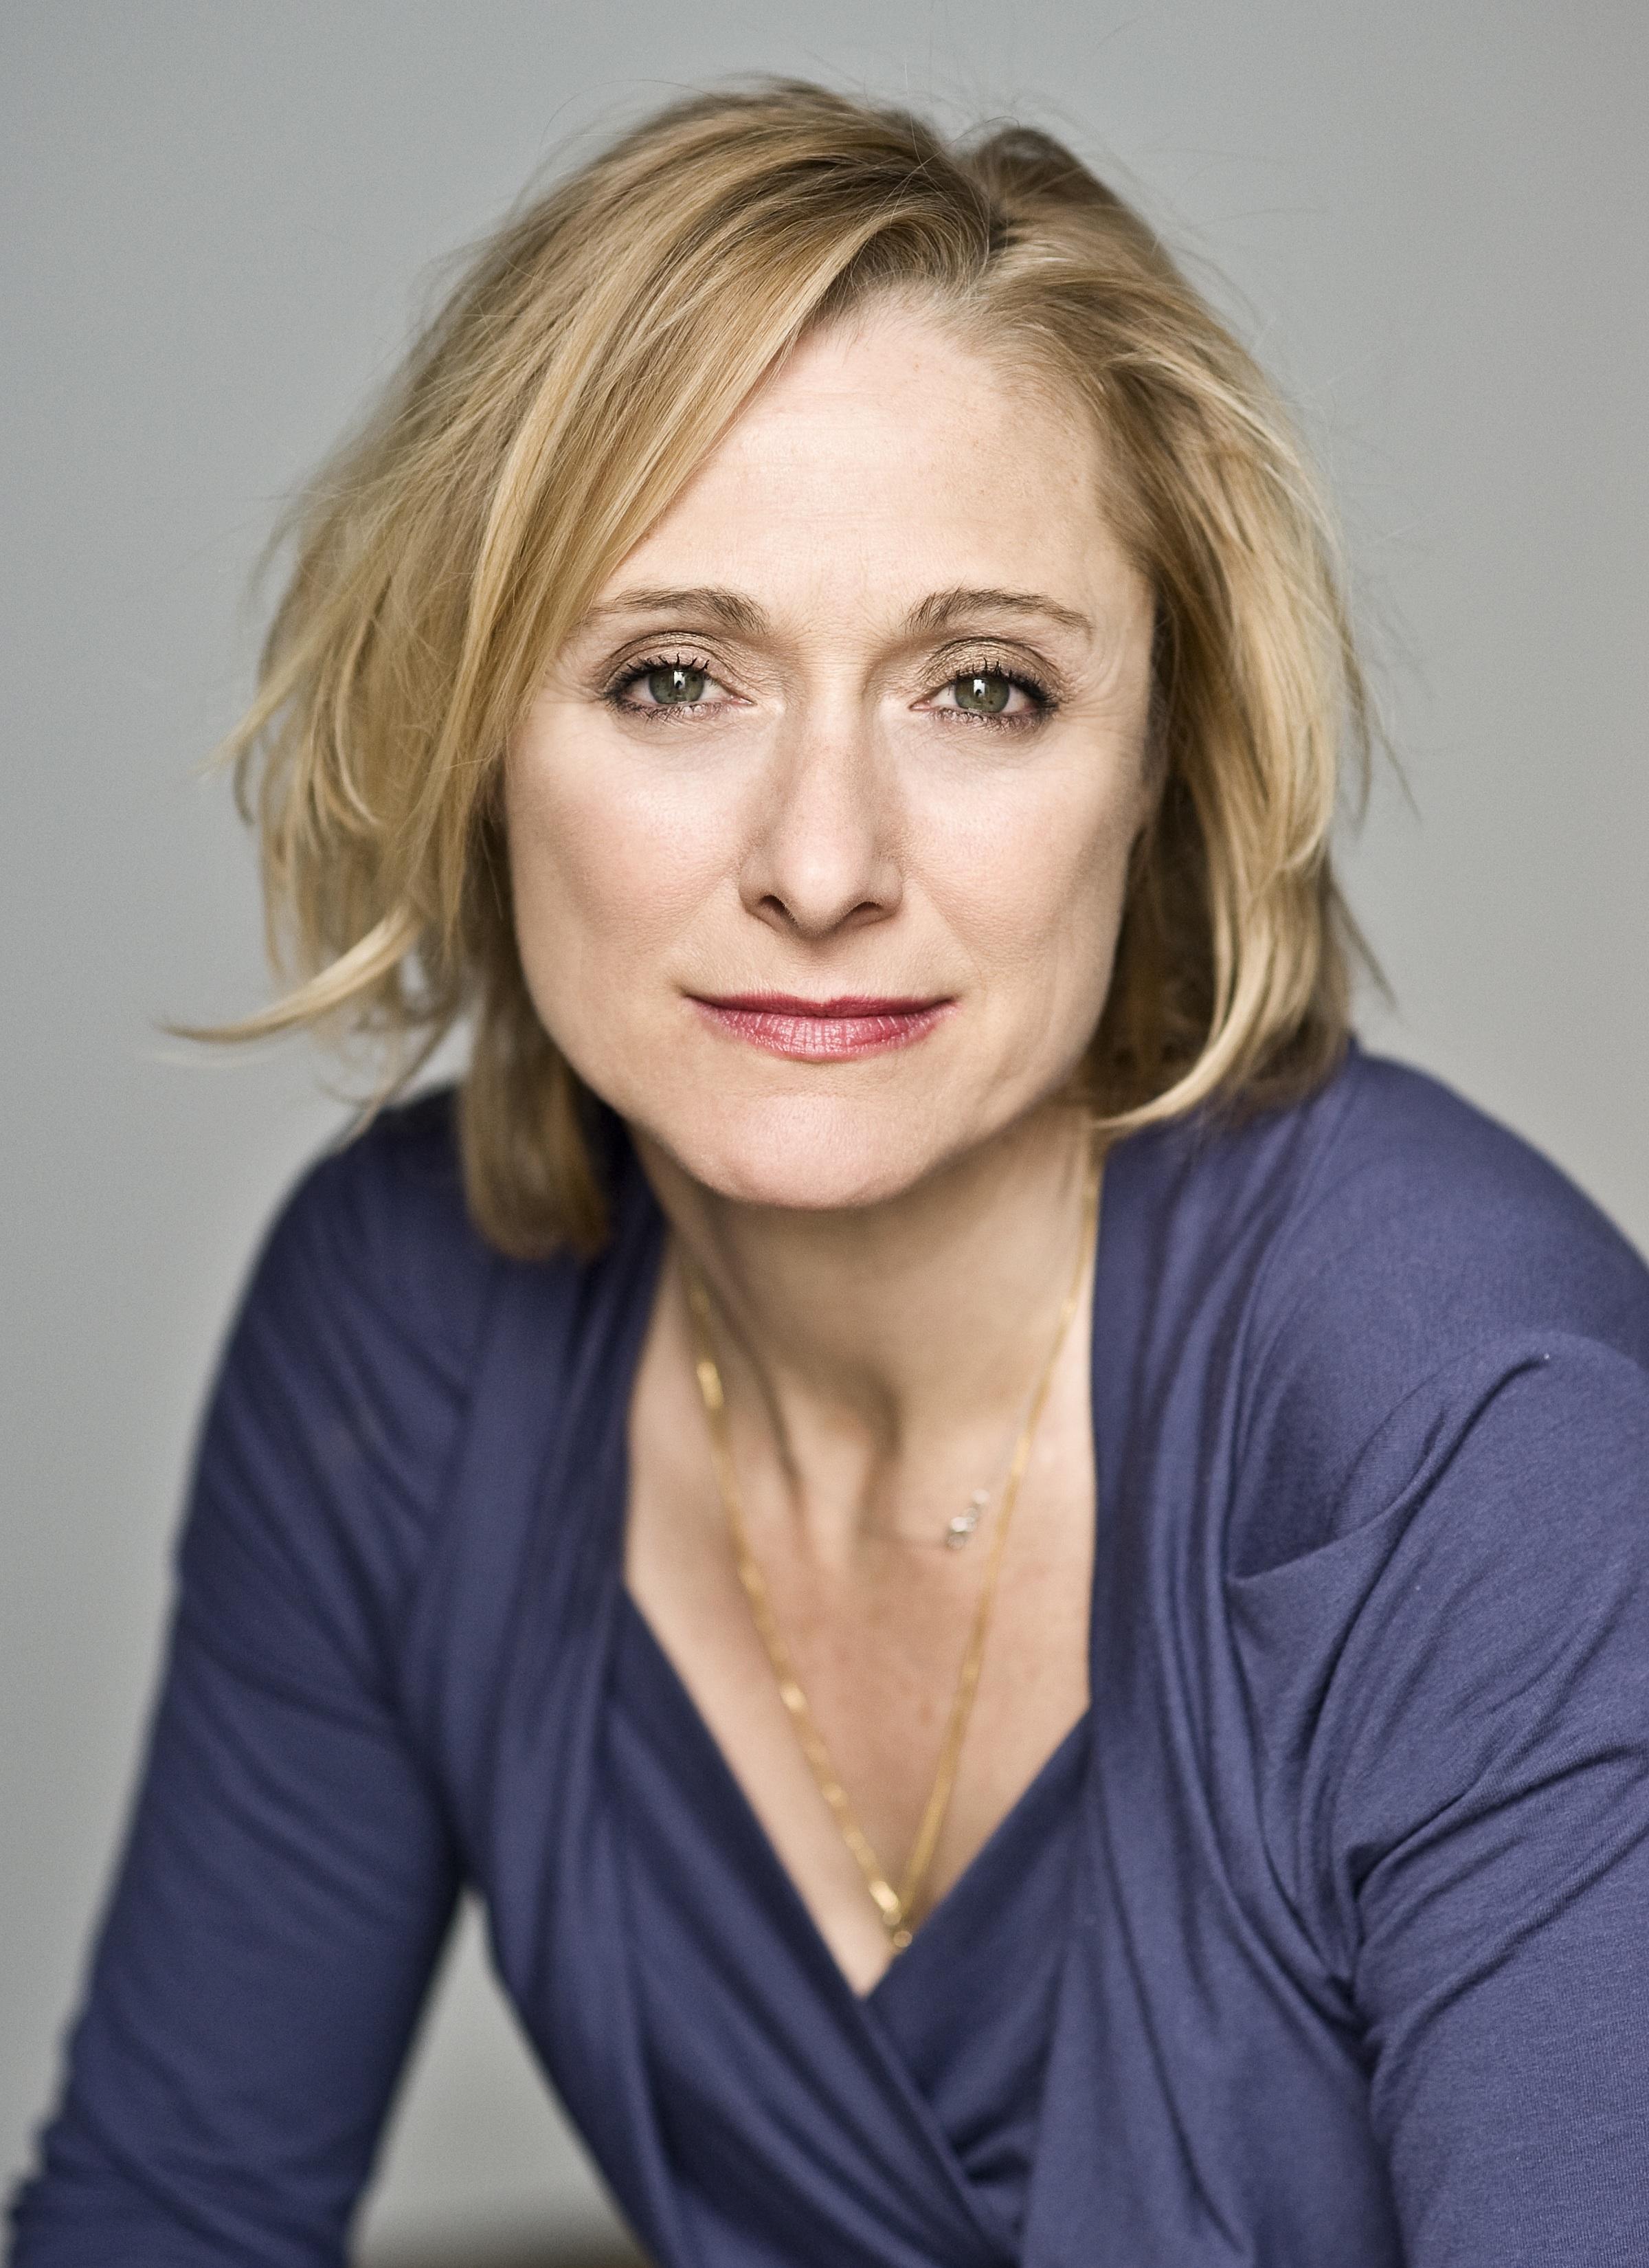 Caroline Goodall (born 1959)